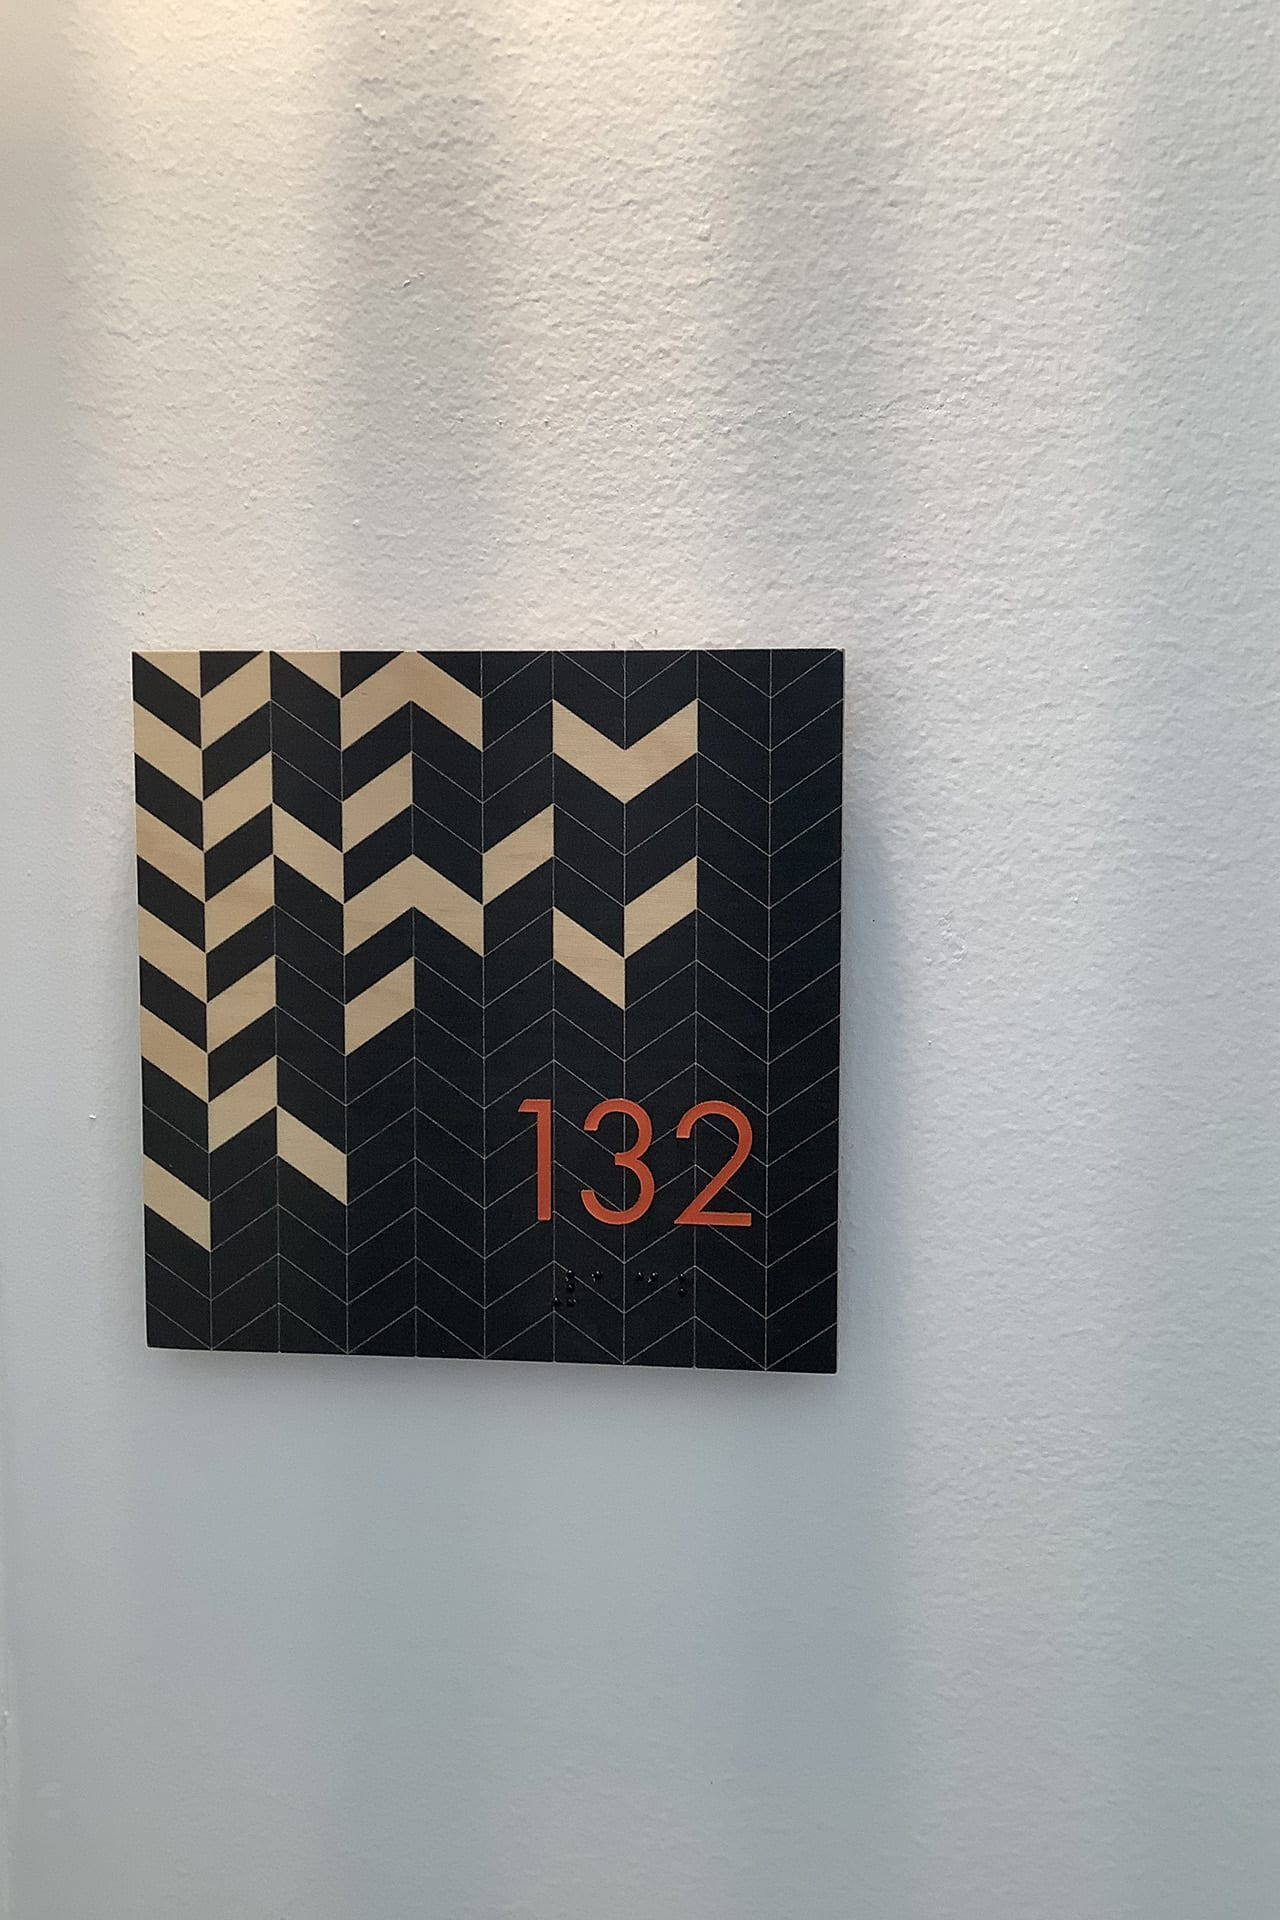 132_unit-number